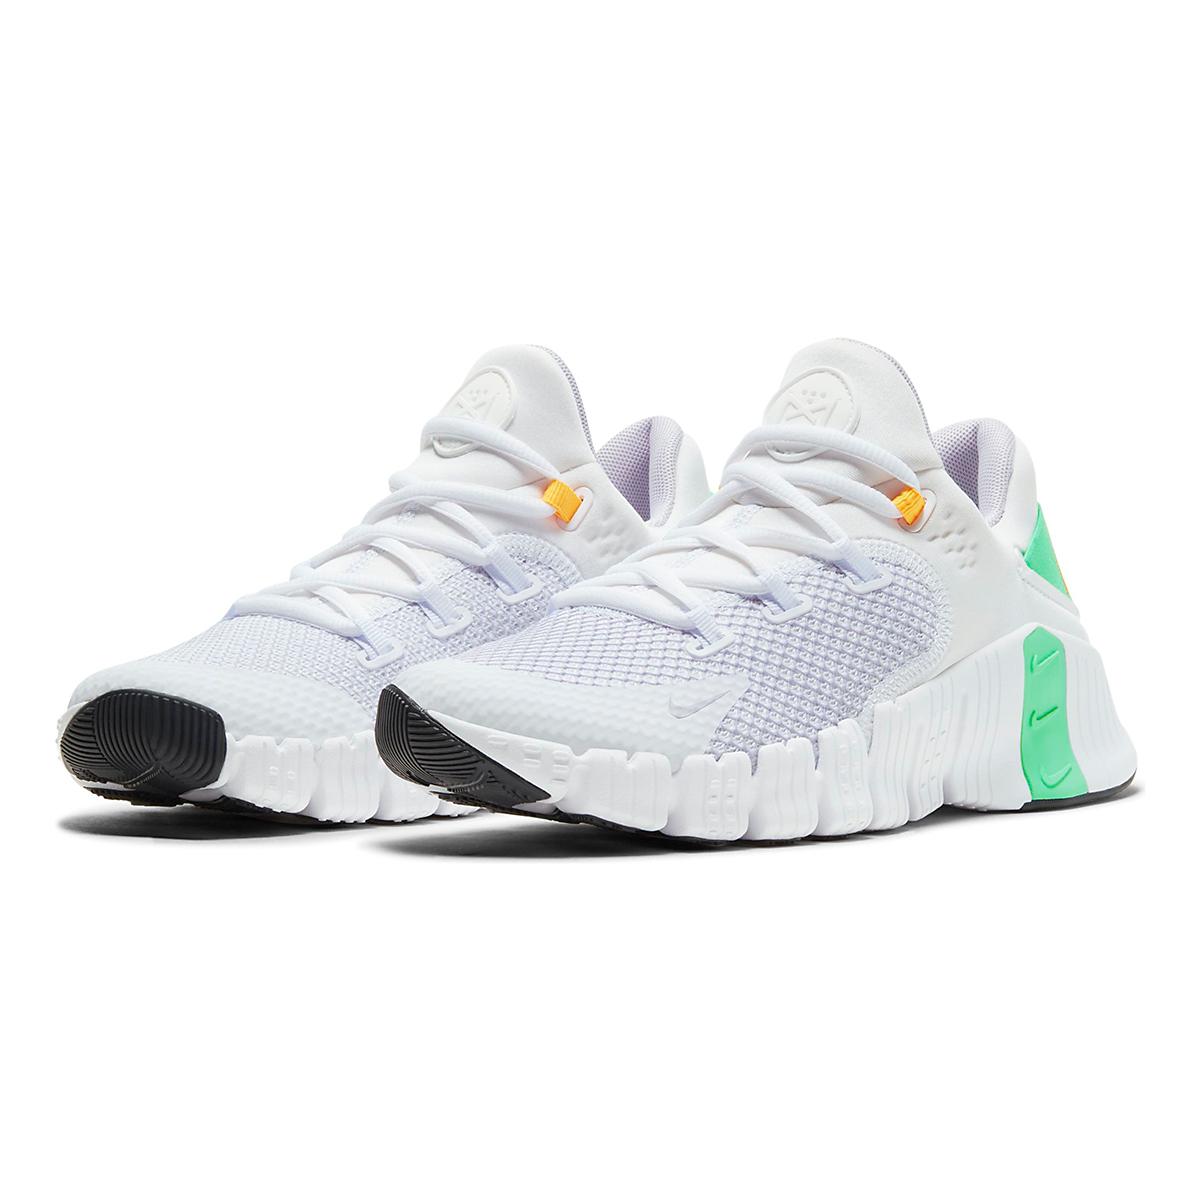 Women's Nike Free Metcon 4 Training Shoe - Color: White/Infinite Lilac/Smoke Grey - Size: 5 - Width: Regular, White/Infinite Lilac/Smoke Grey, large, image 3